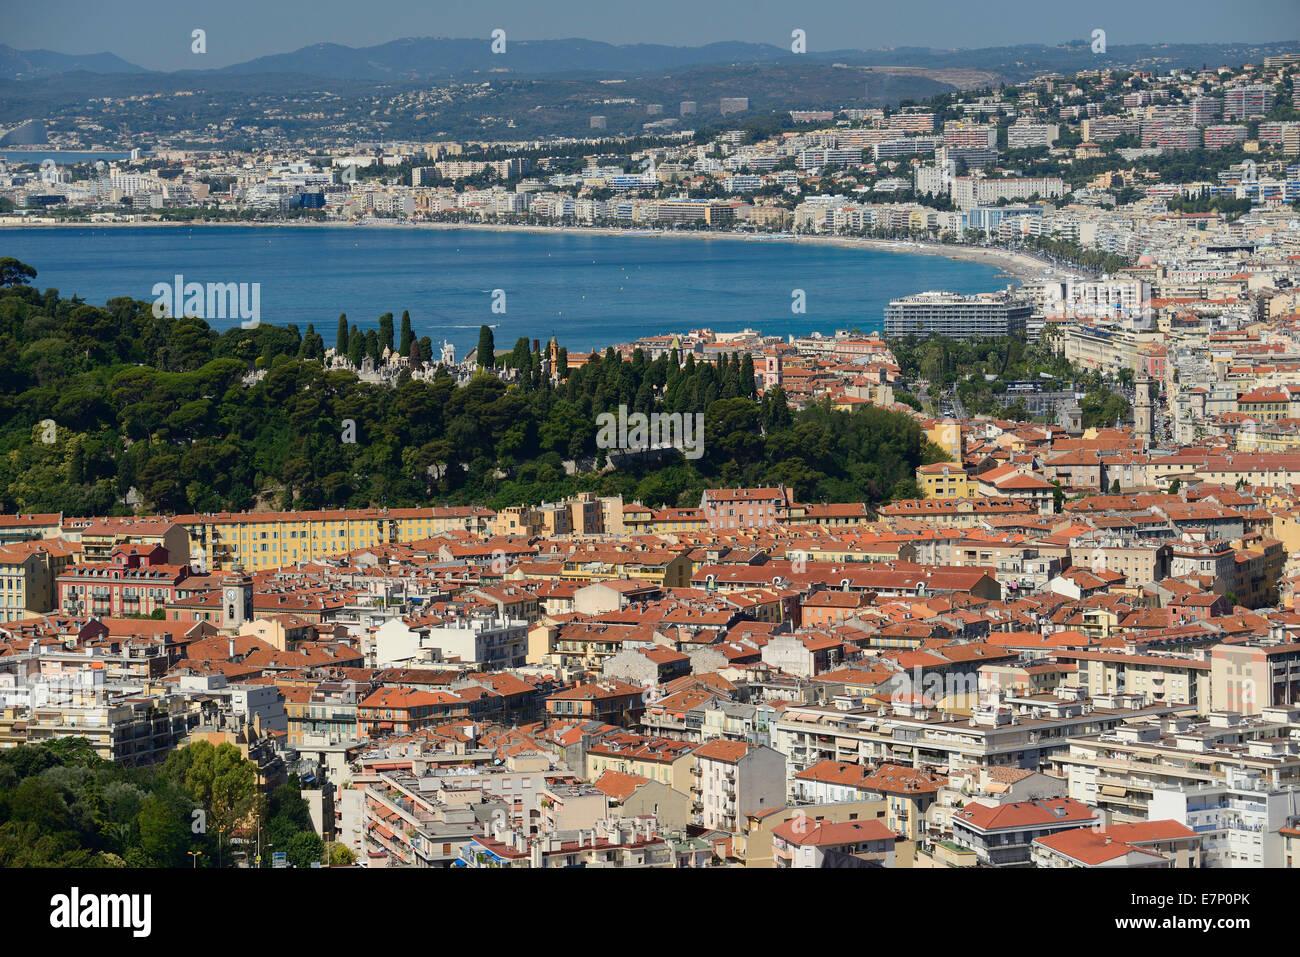 Europe, France, Cote d'Azur, Nice, Nizza, city, Riviera, coast, bay, Mediterranean - Stock Image